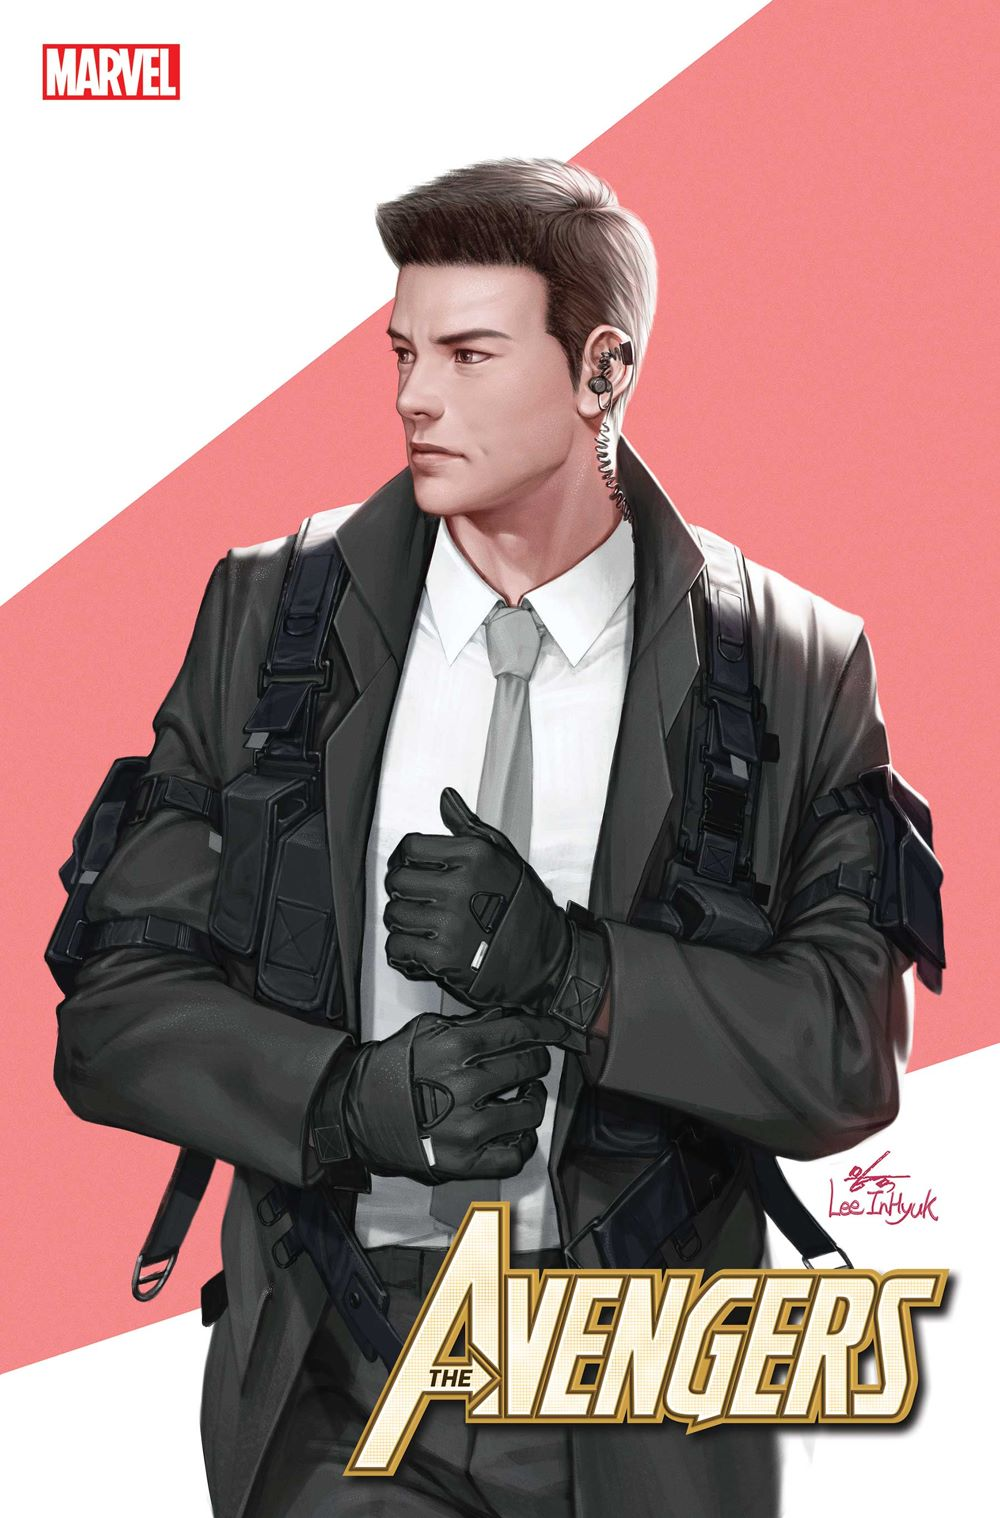 AVEN2018047_InHyuk-Lee_VAR-1 Marvel Comics August 2021 Solicitations